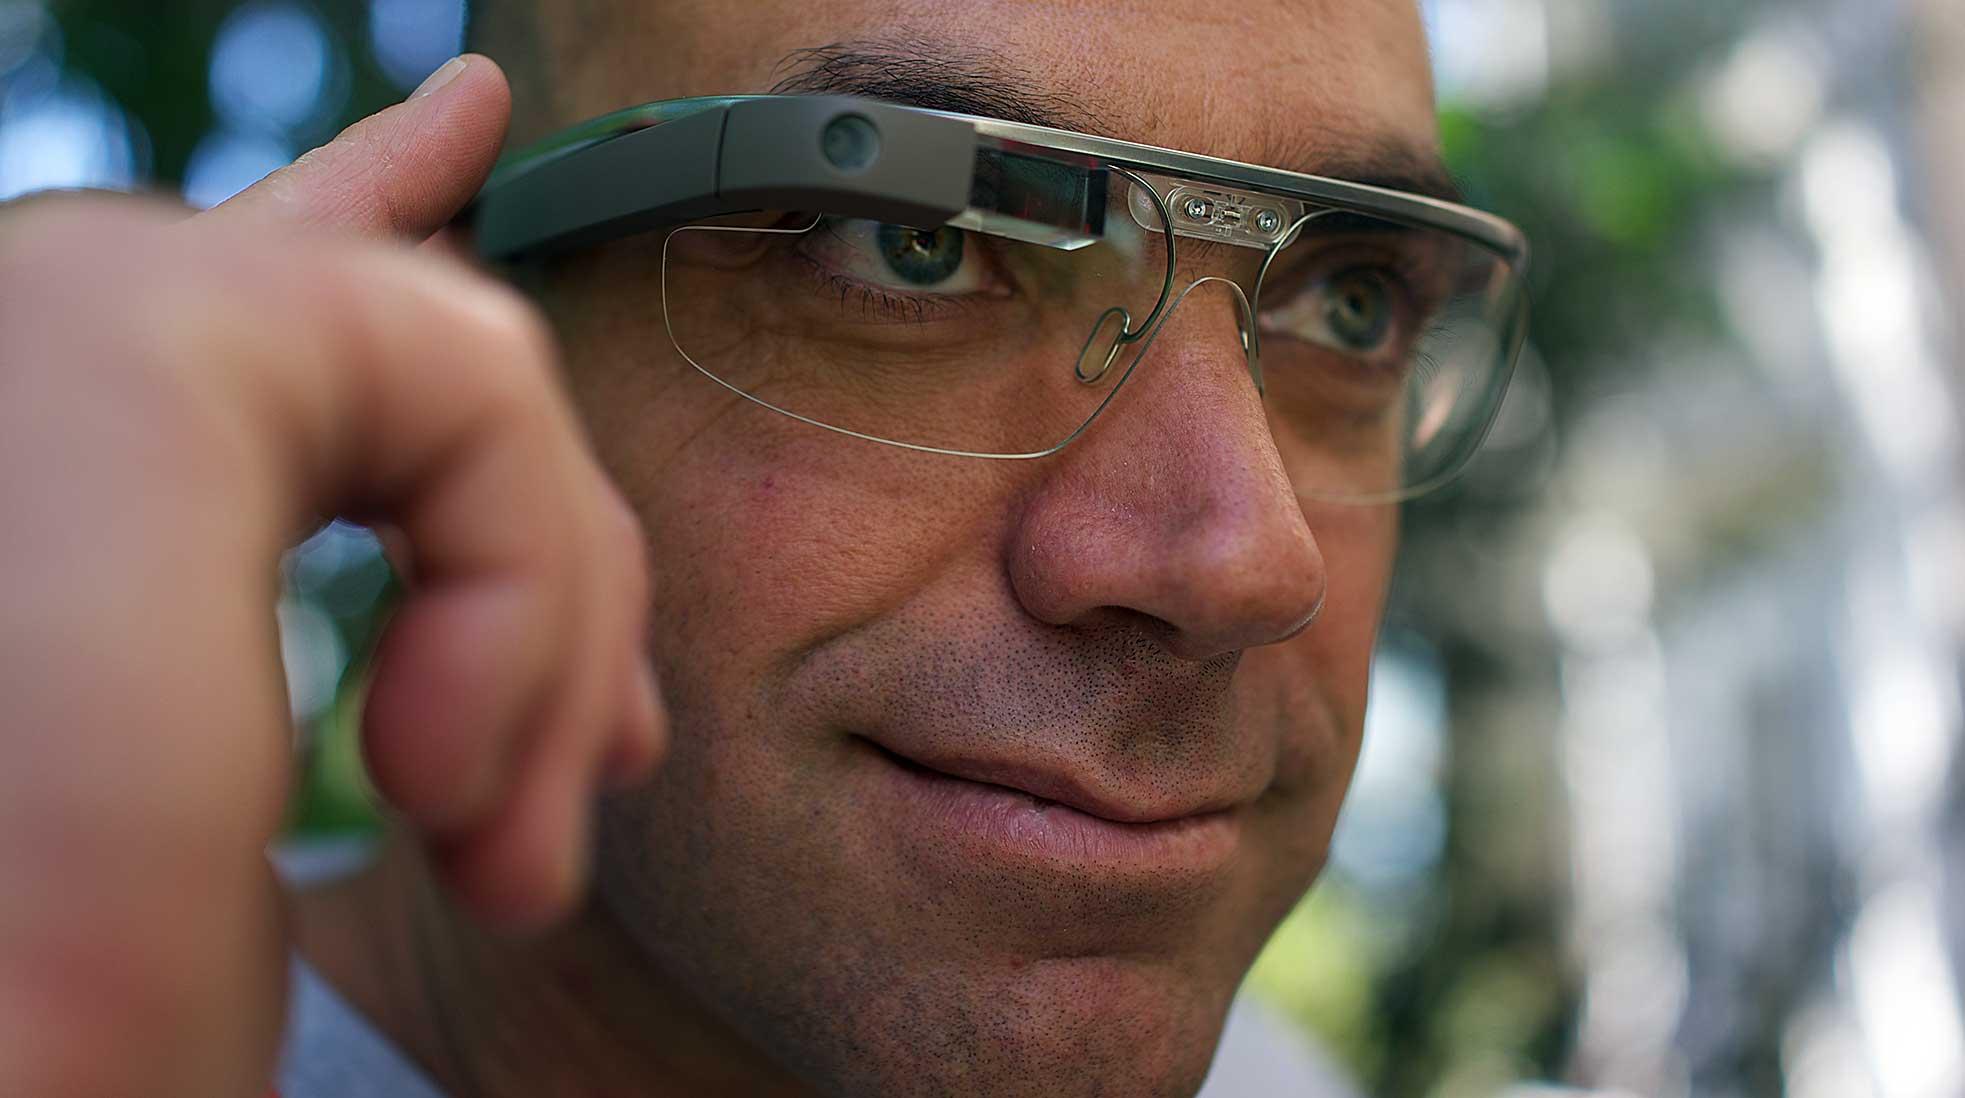 A male person wearing Google's smart glasses Google Glass